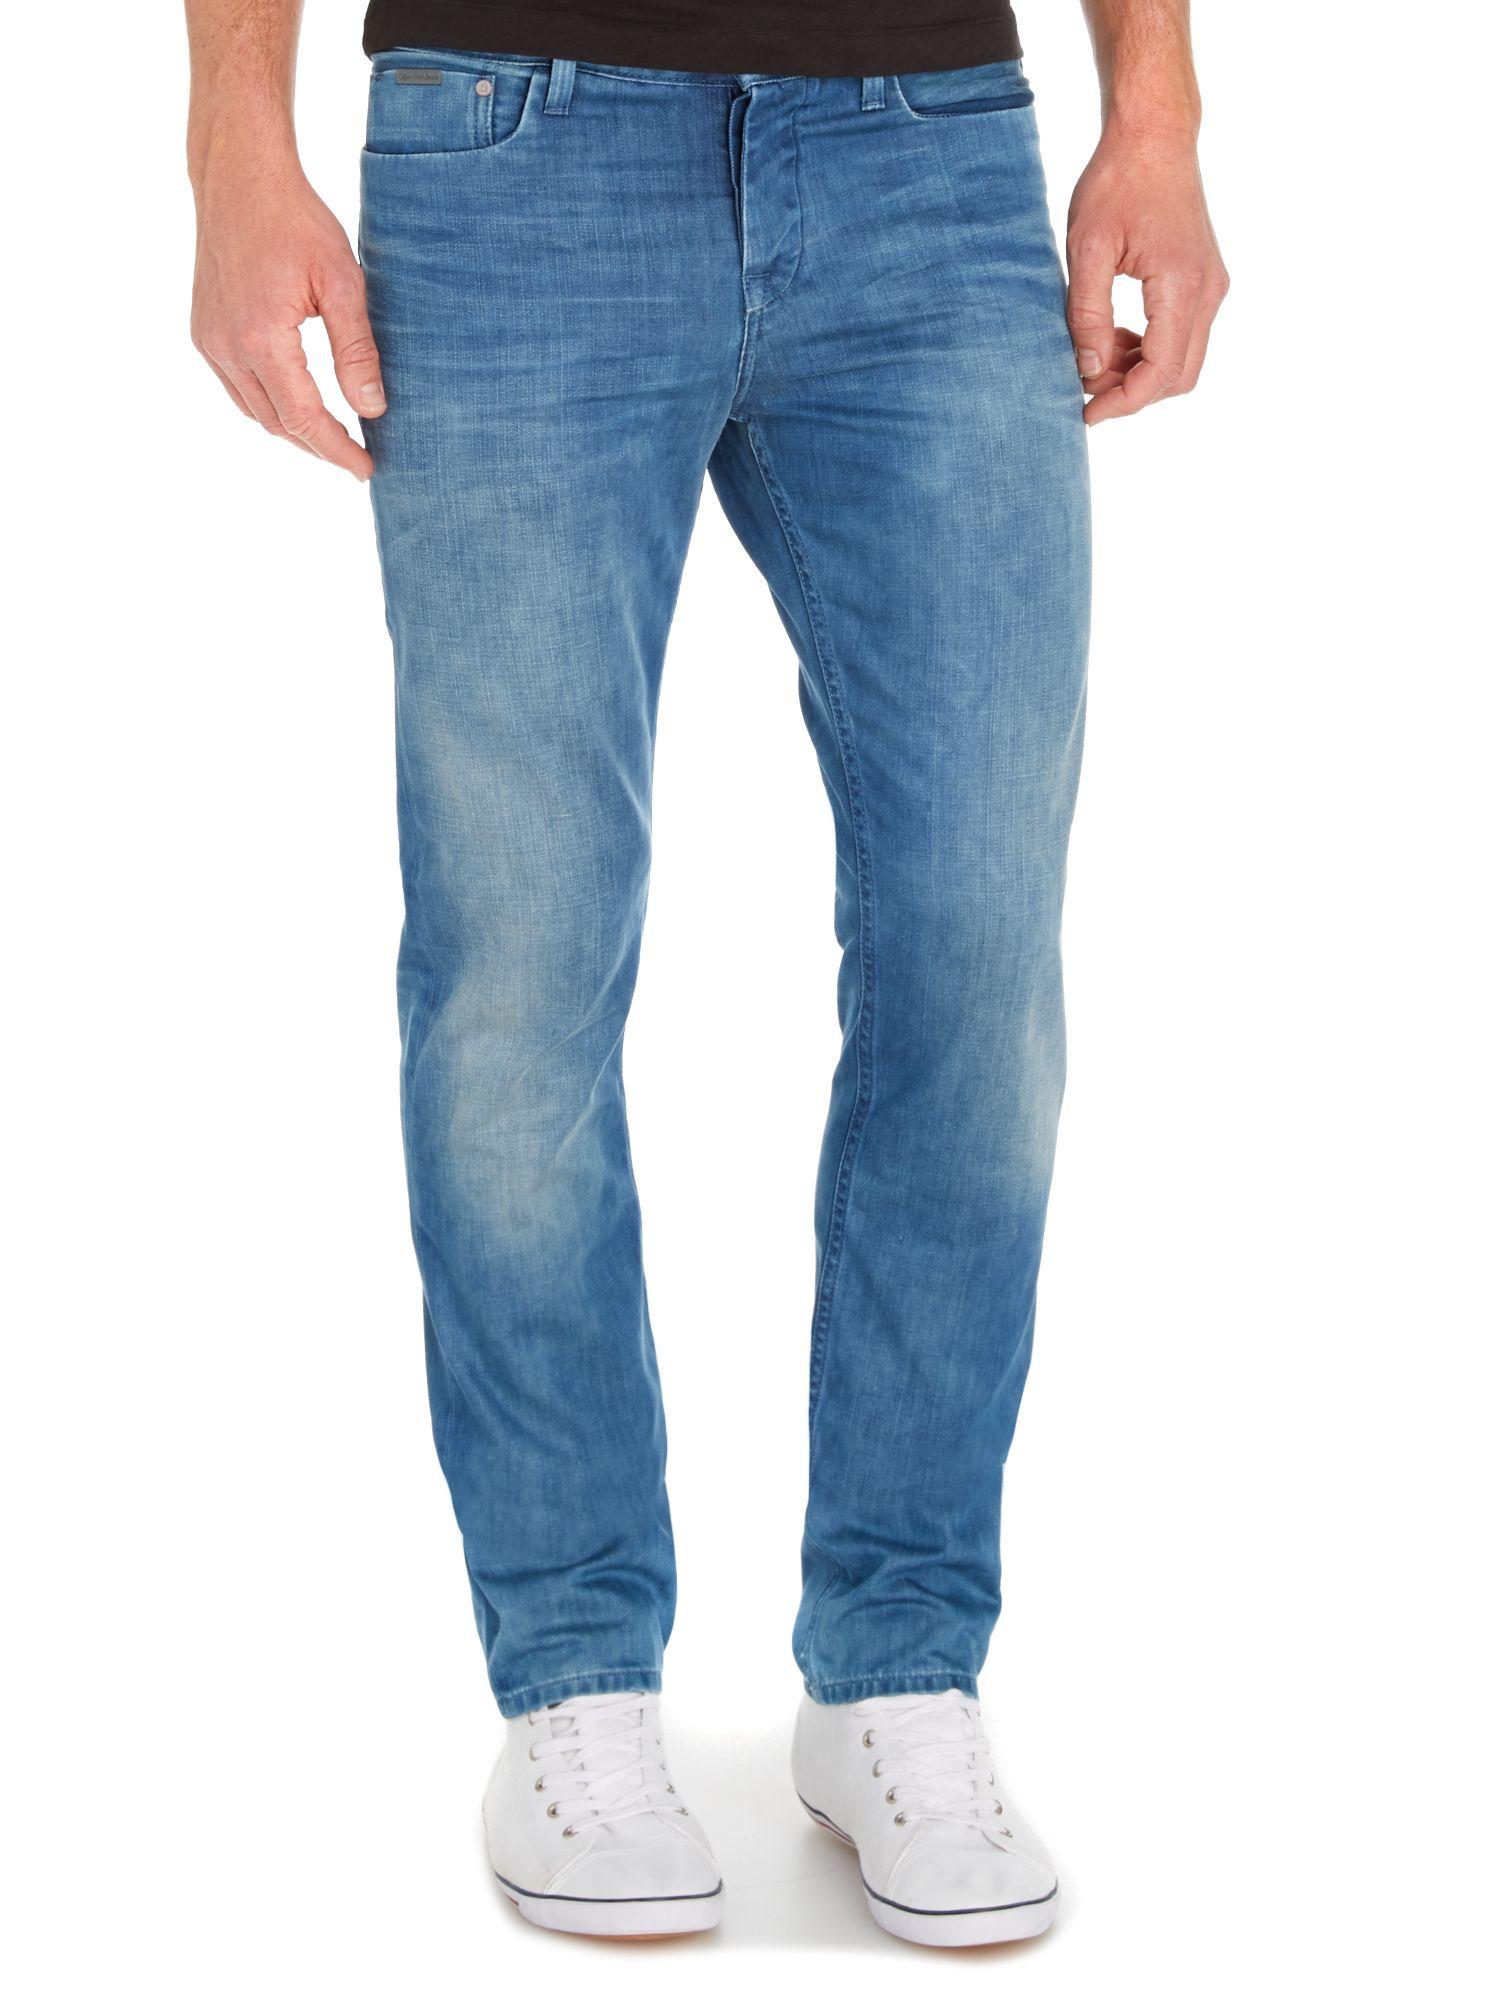 calvin klein slim straight jean in blue for men lyst. Black Bedroom Furniture Sets. Home Design Ideas